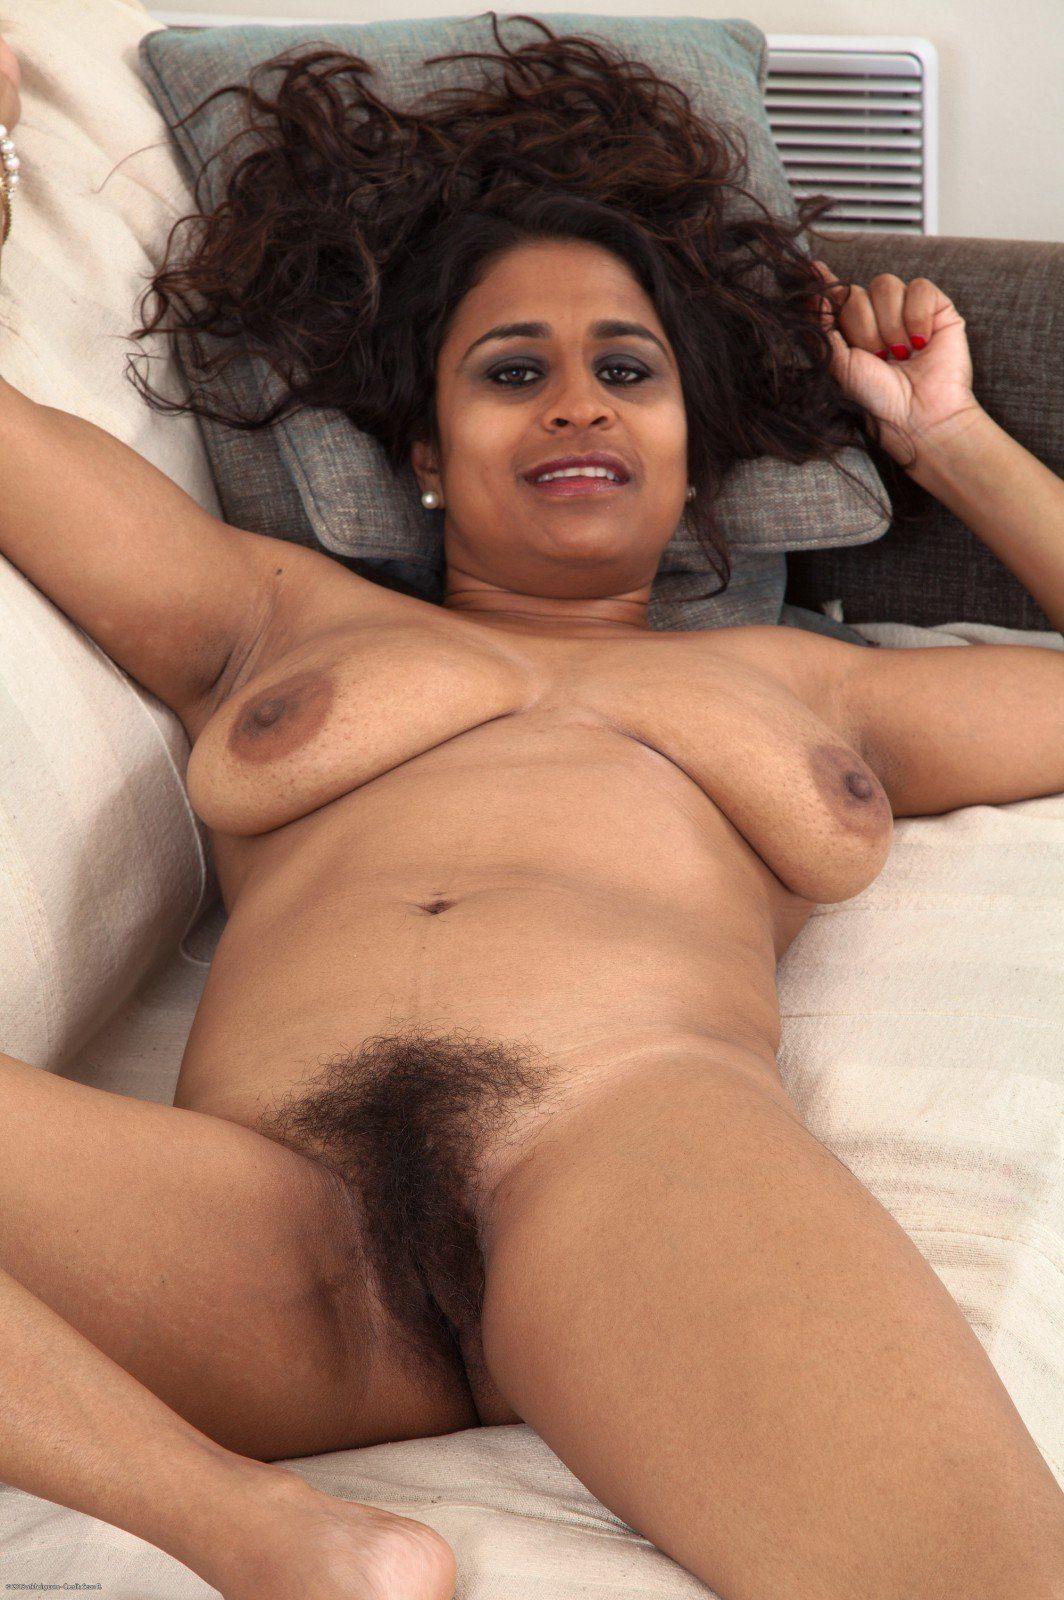 And atk hairy mature black women